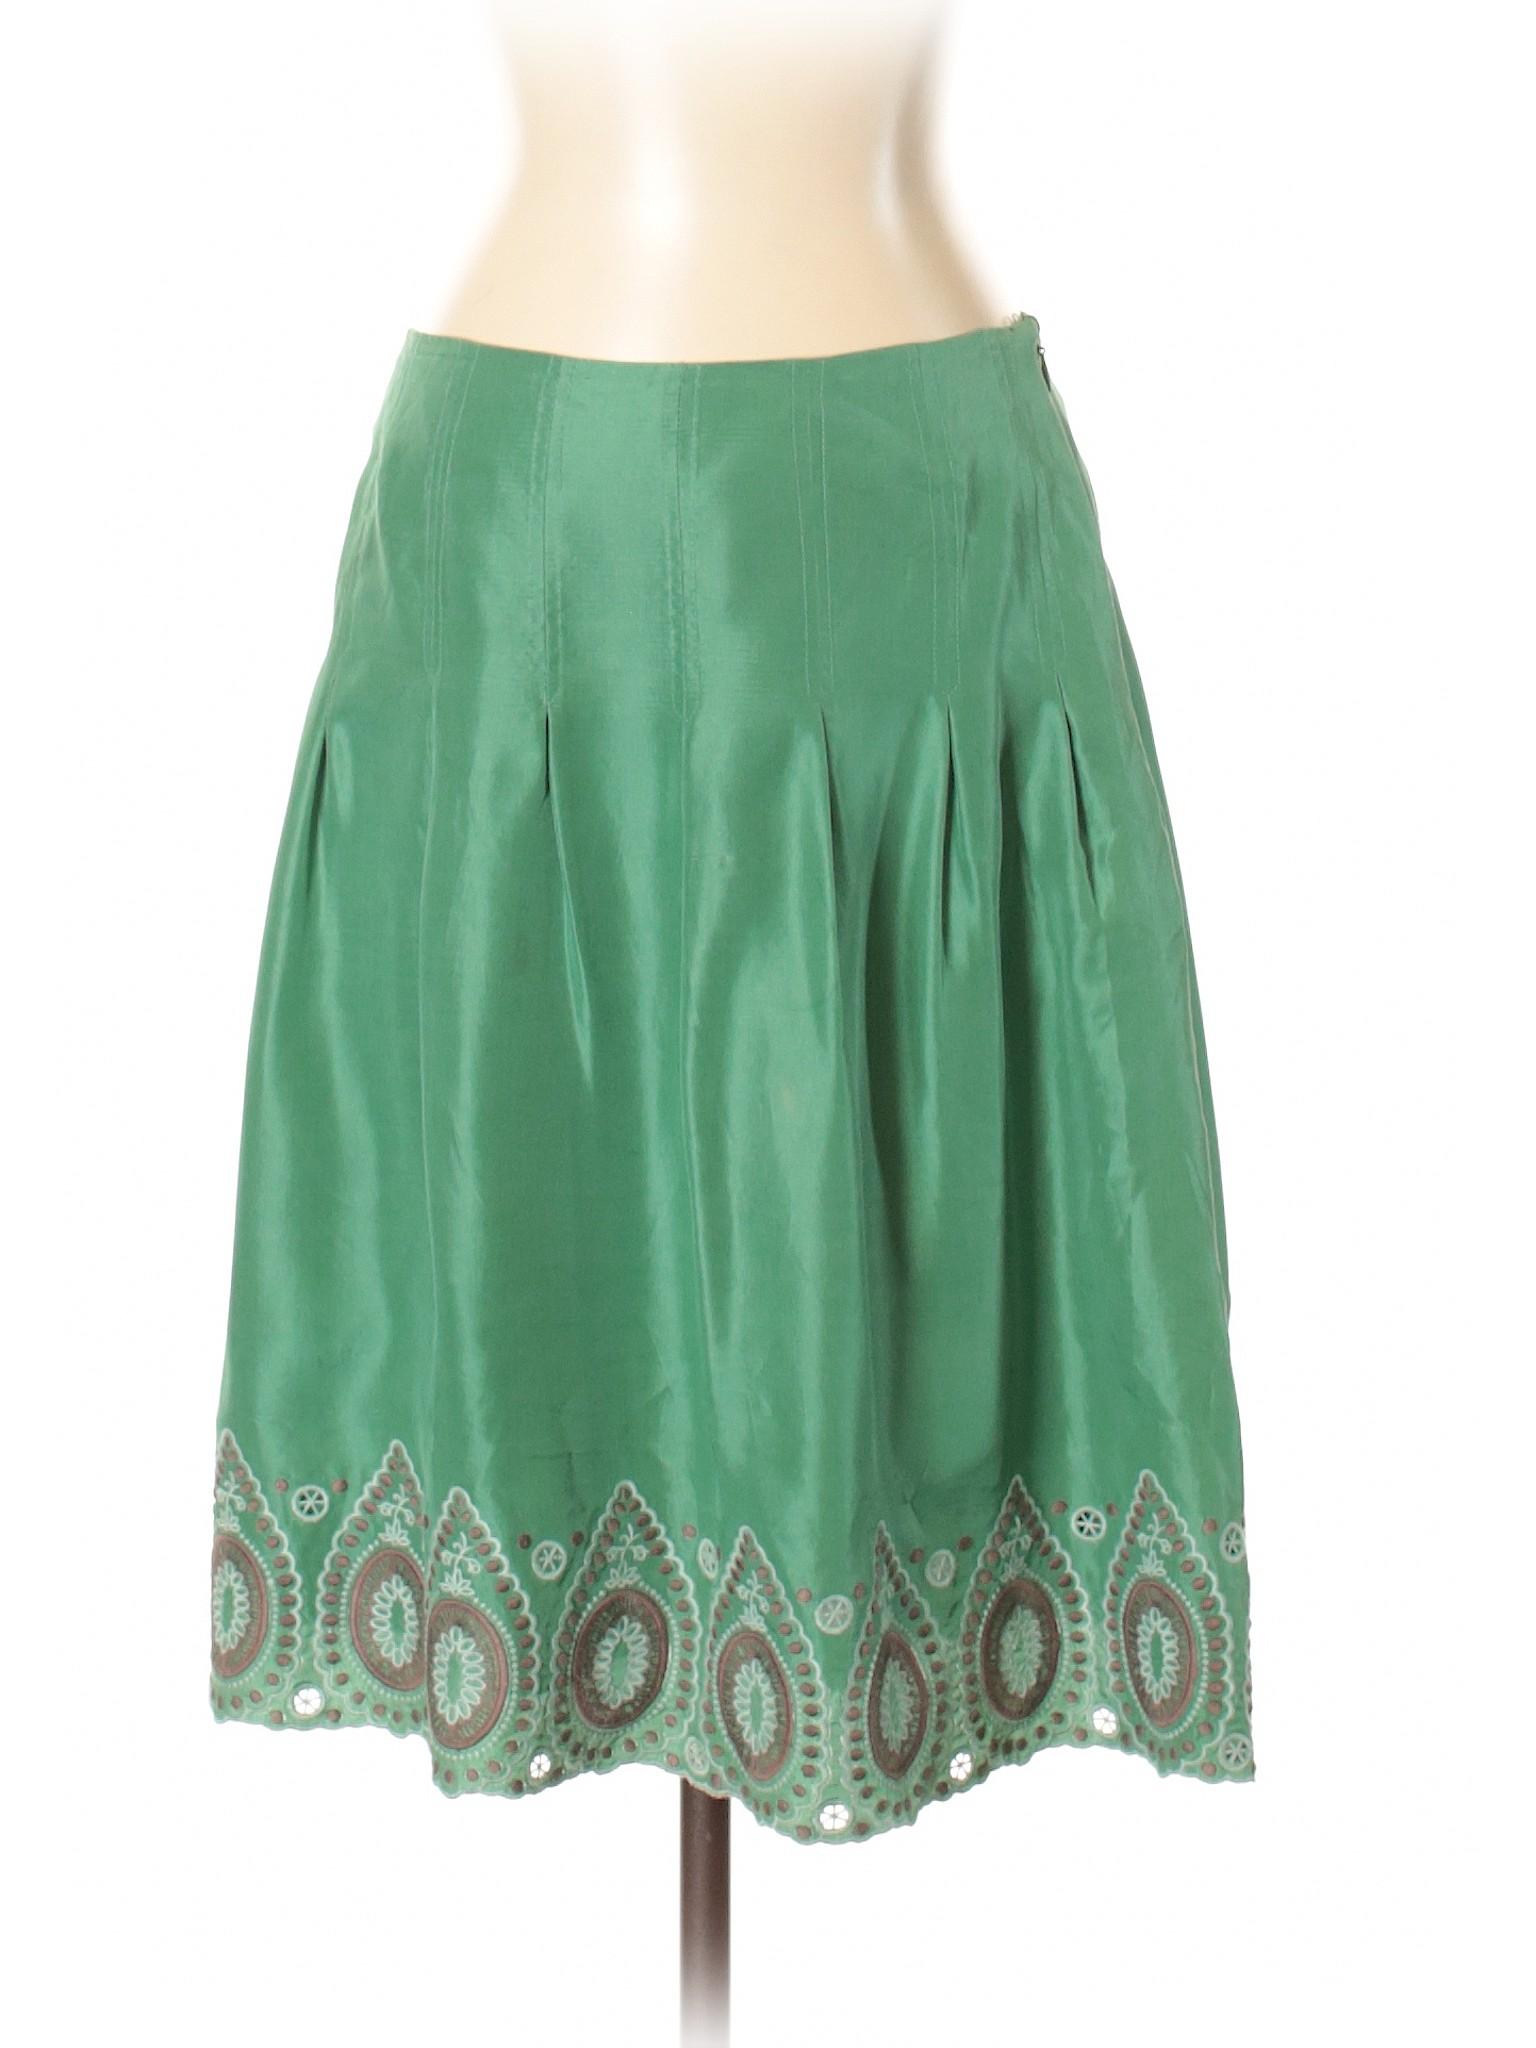 Boutique Boutique Silk Skirt Skirt Silk Boutique Silk Skirt Boutique Silk rw6rvqO